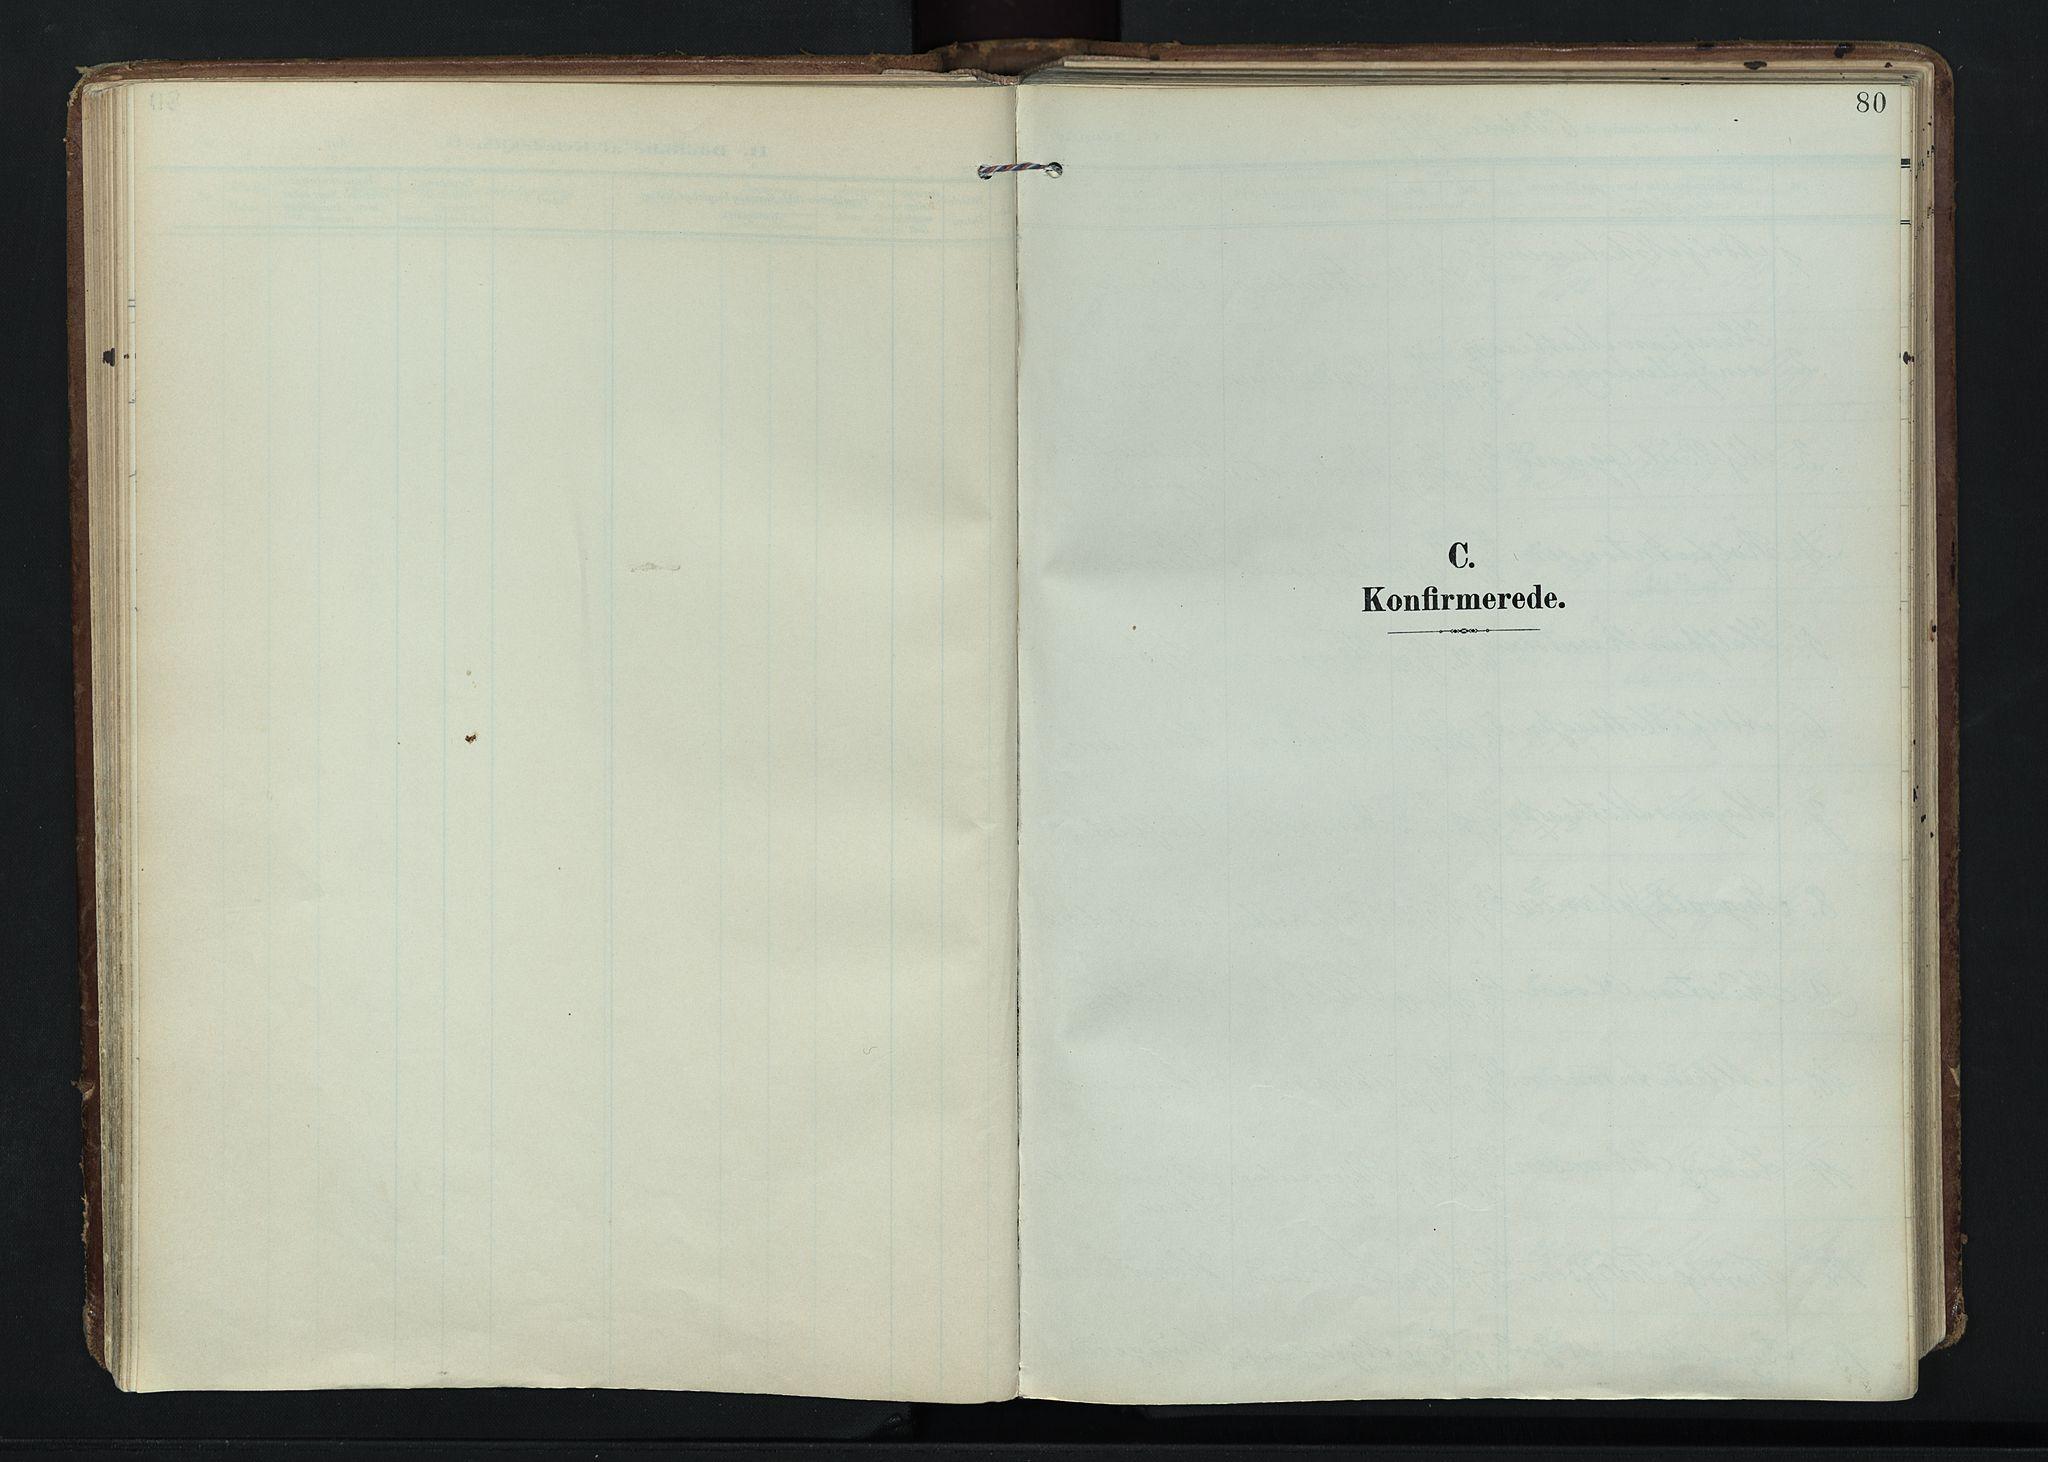 SAH, Vardal prestekontor, H/Ha/Haa/L0020: Ministerialbok nr. 20, 1907-1921, s. 80